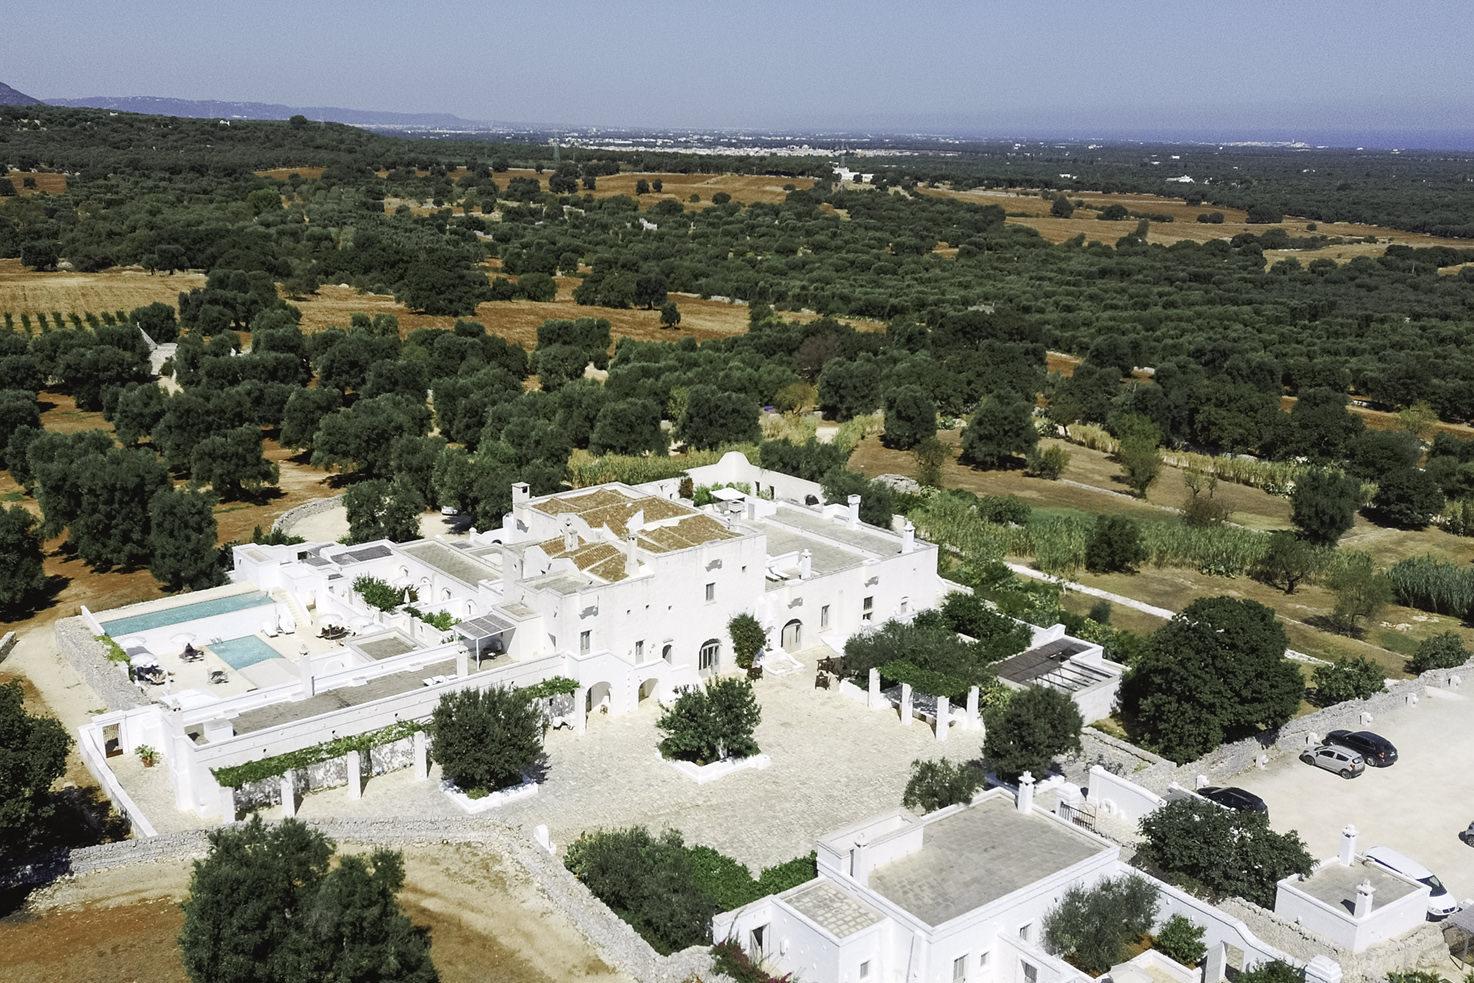 Aerial view of Masseria Le Carrube, Puglia